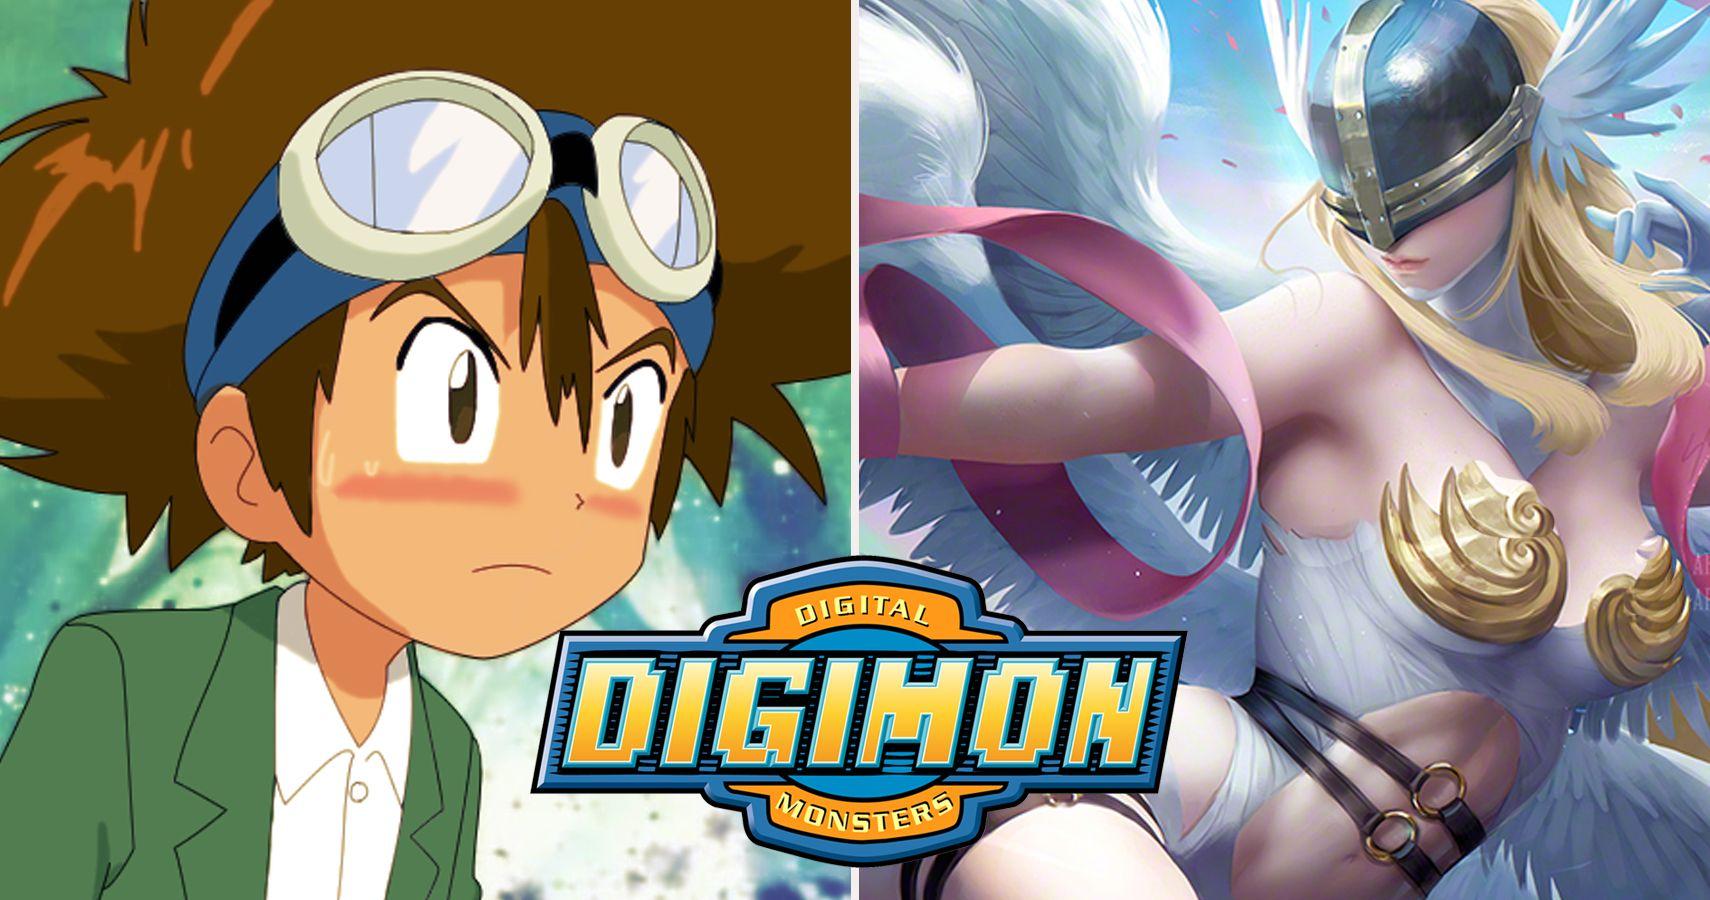 Secrets The Creators Of Digimon Want To Bury   TheGamer